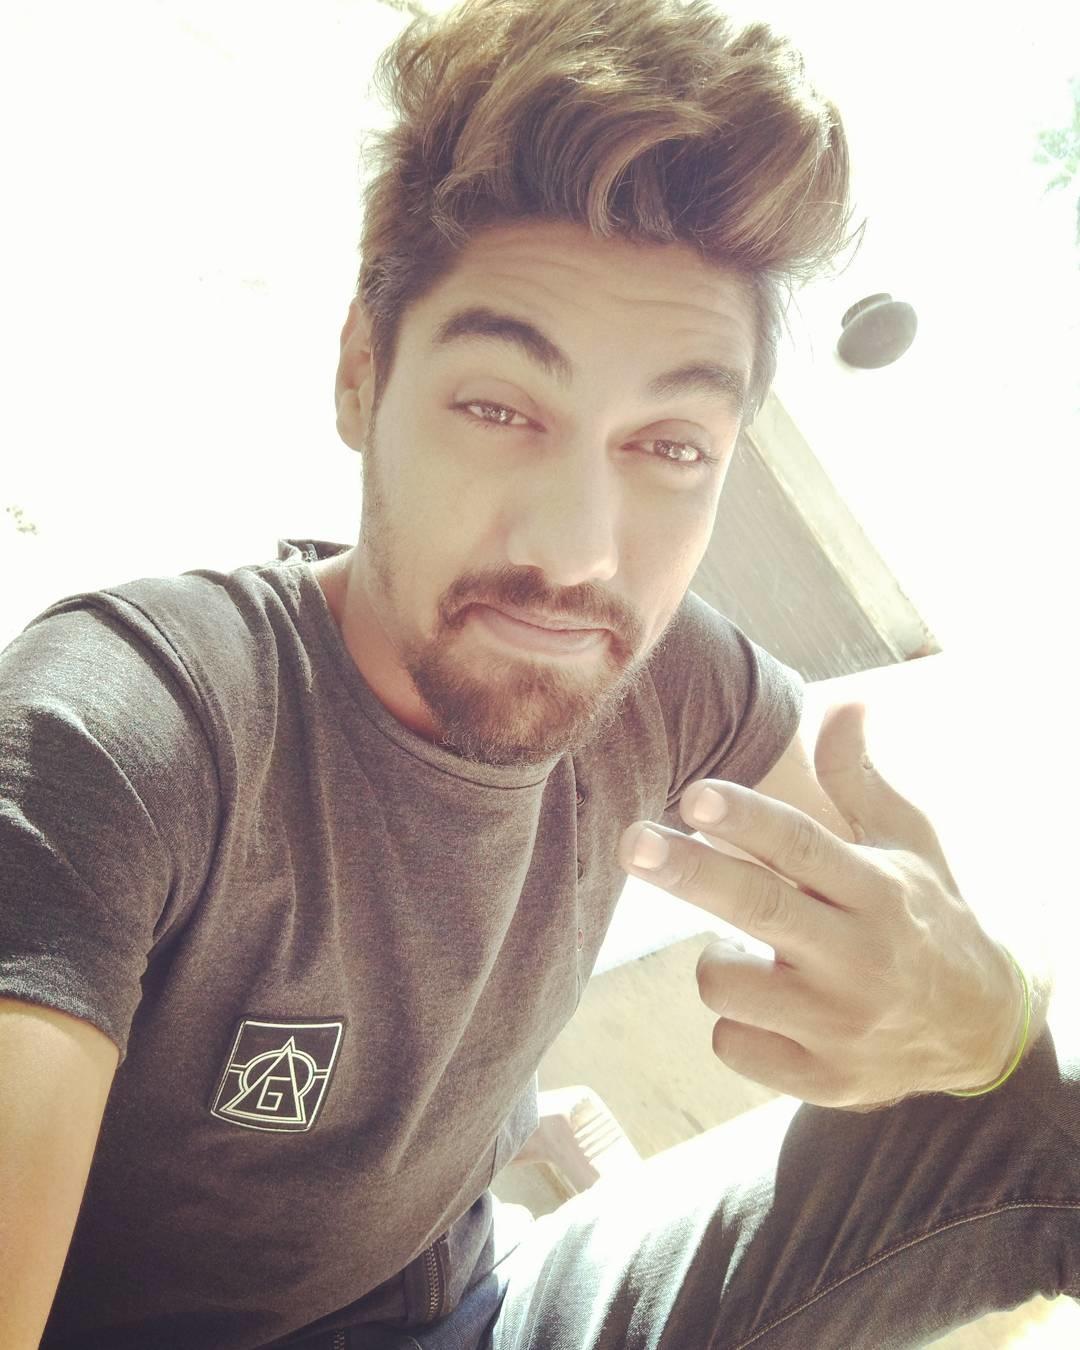 #newhairstyle #hairlook  #newlook  #bearded-men #bearddo